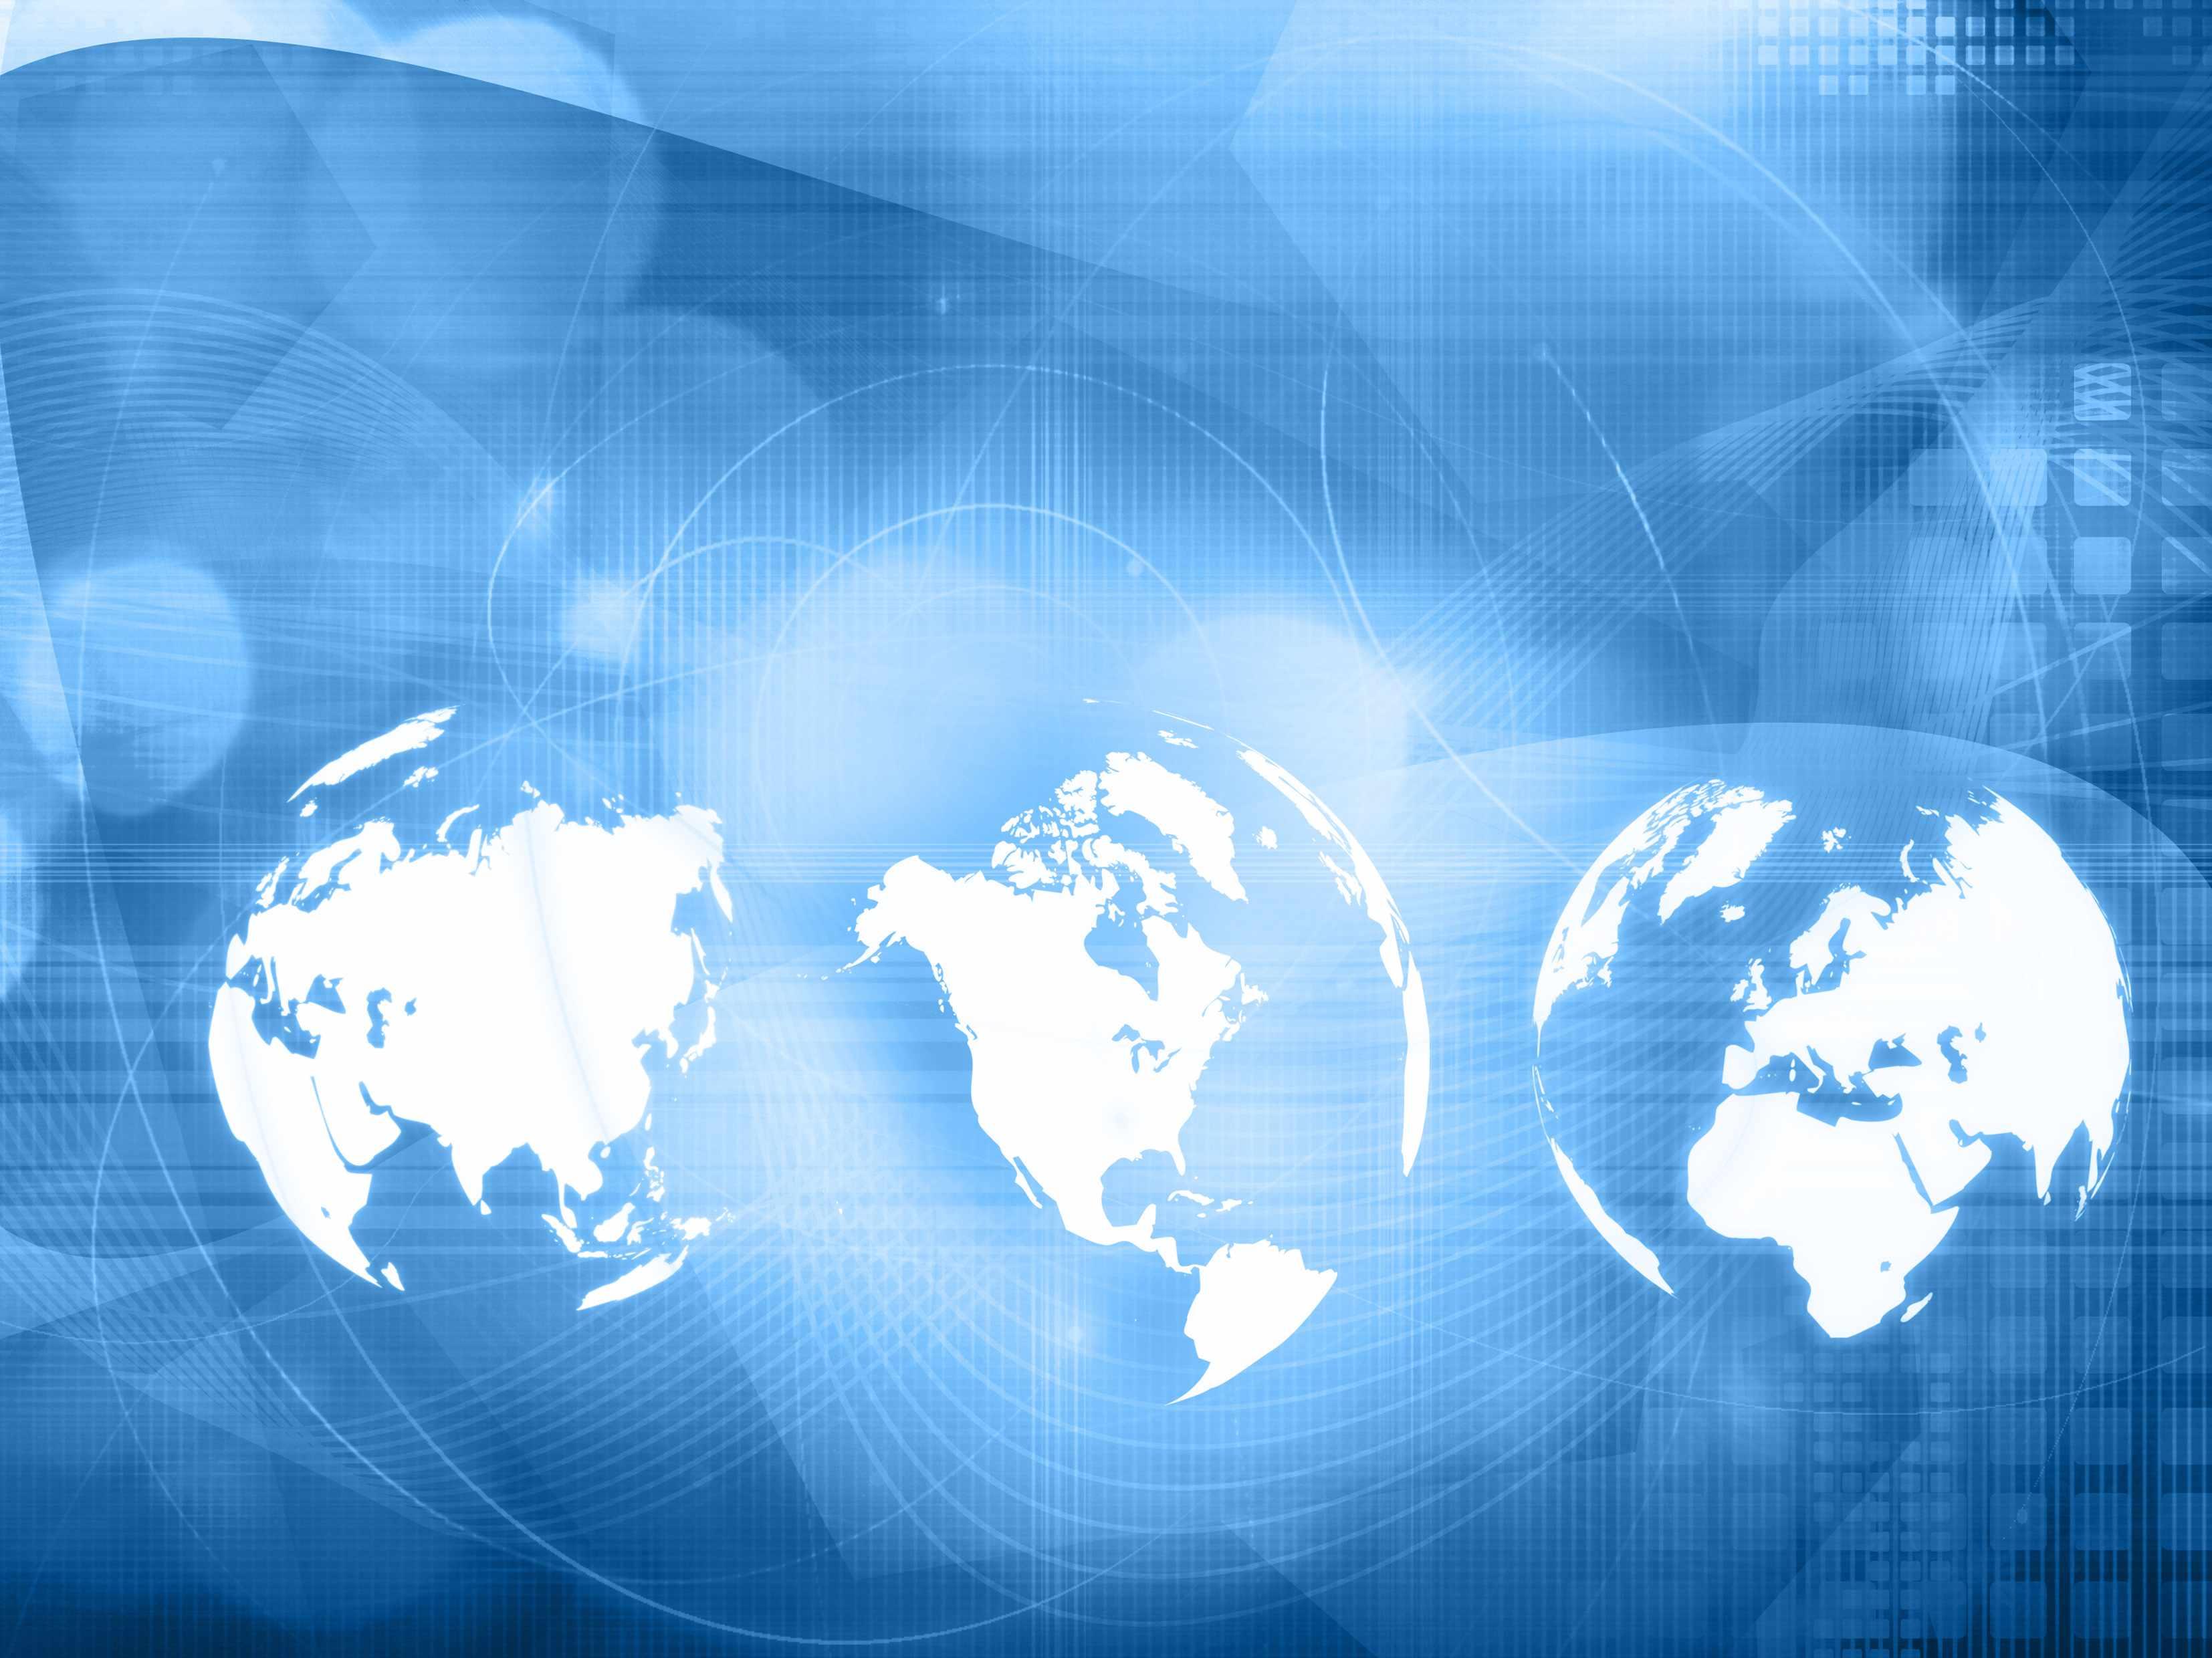 global digital image of the world, social media